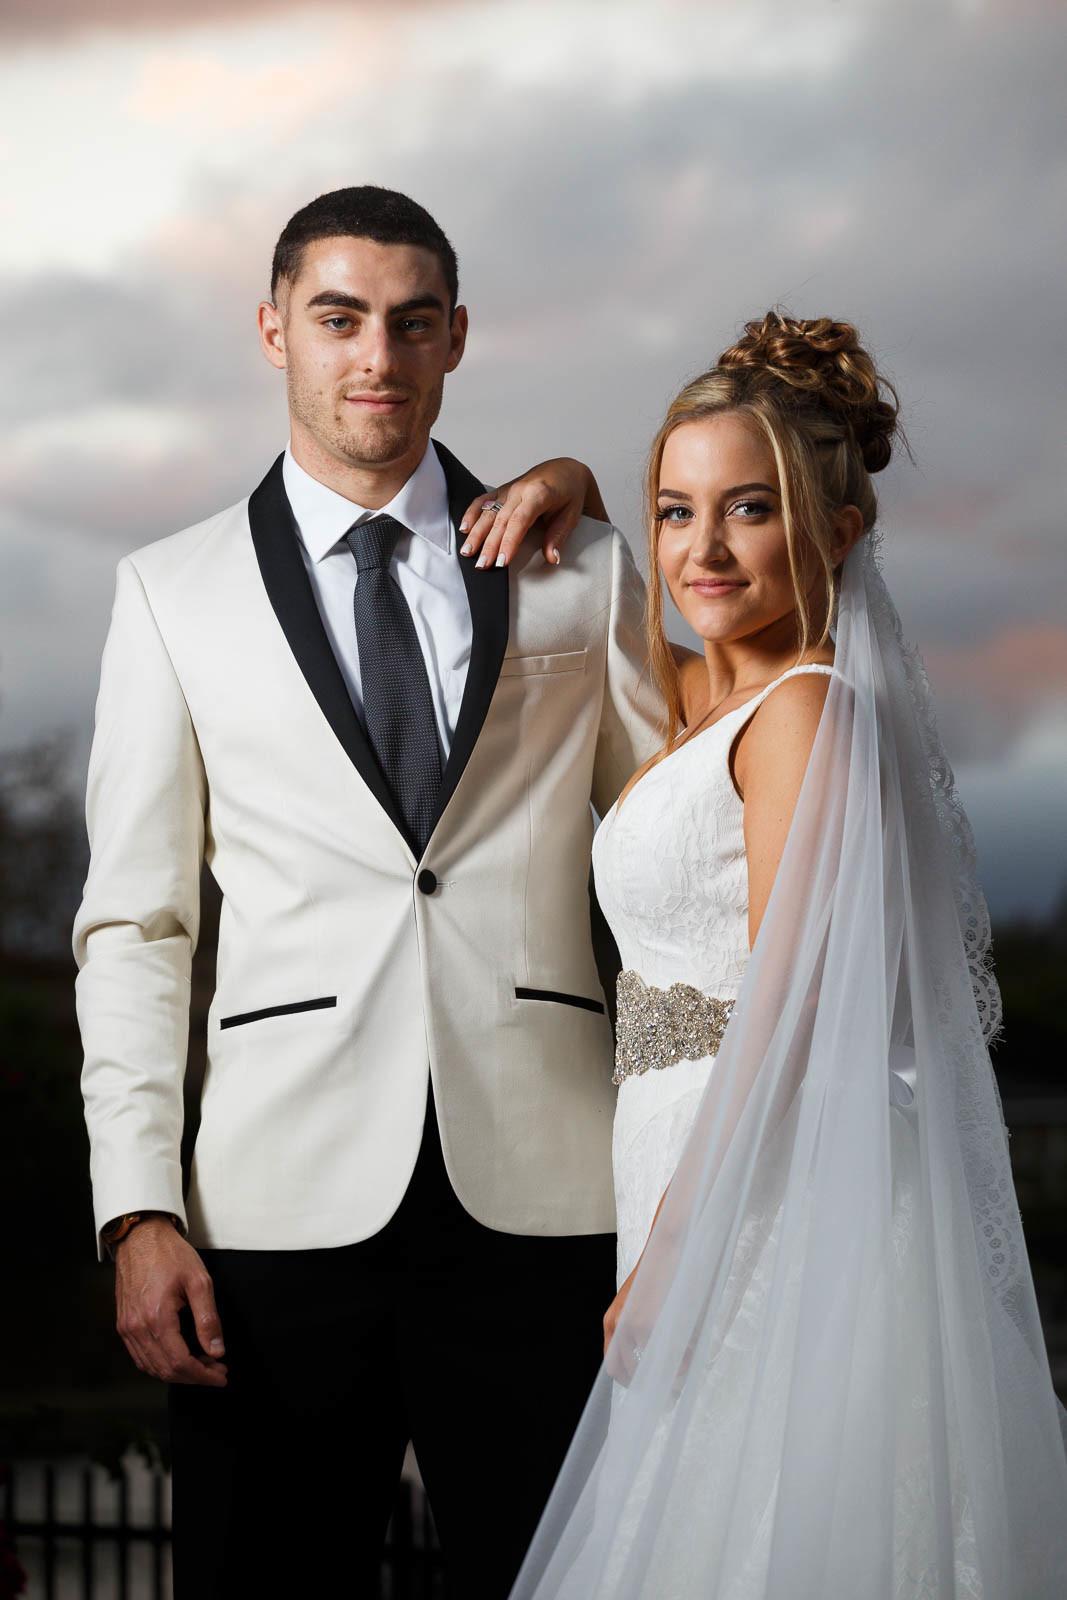 Colin and Alicia Wedding, Lakeside Country Club Wedding,Sunset Wedding Photos, Destination Wedding